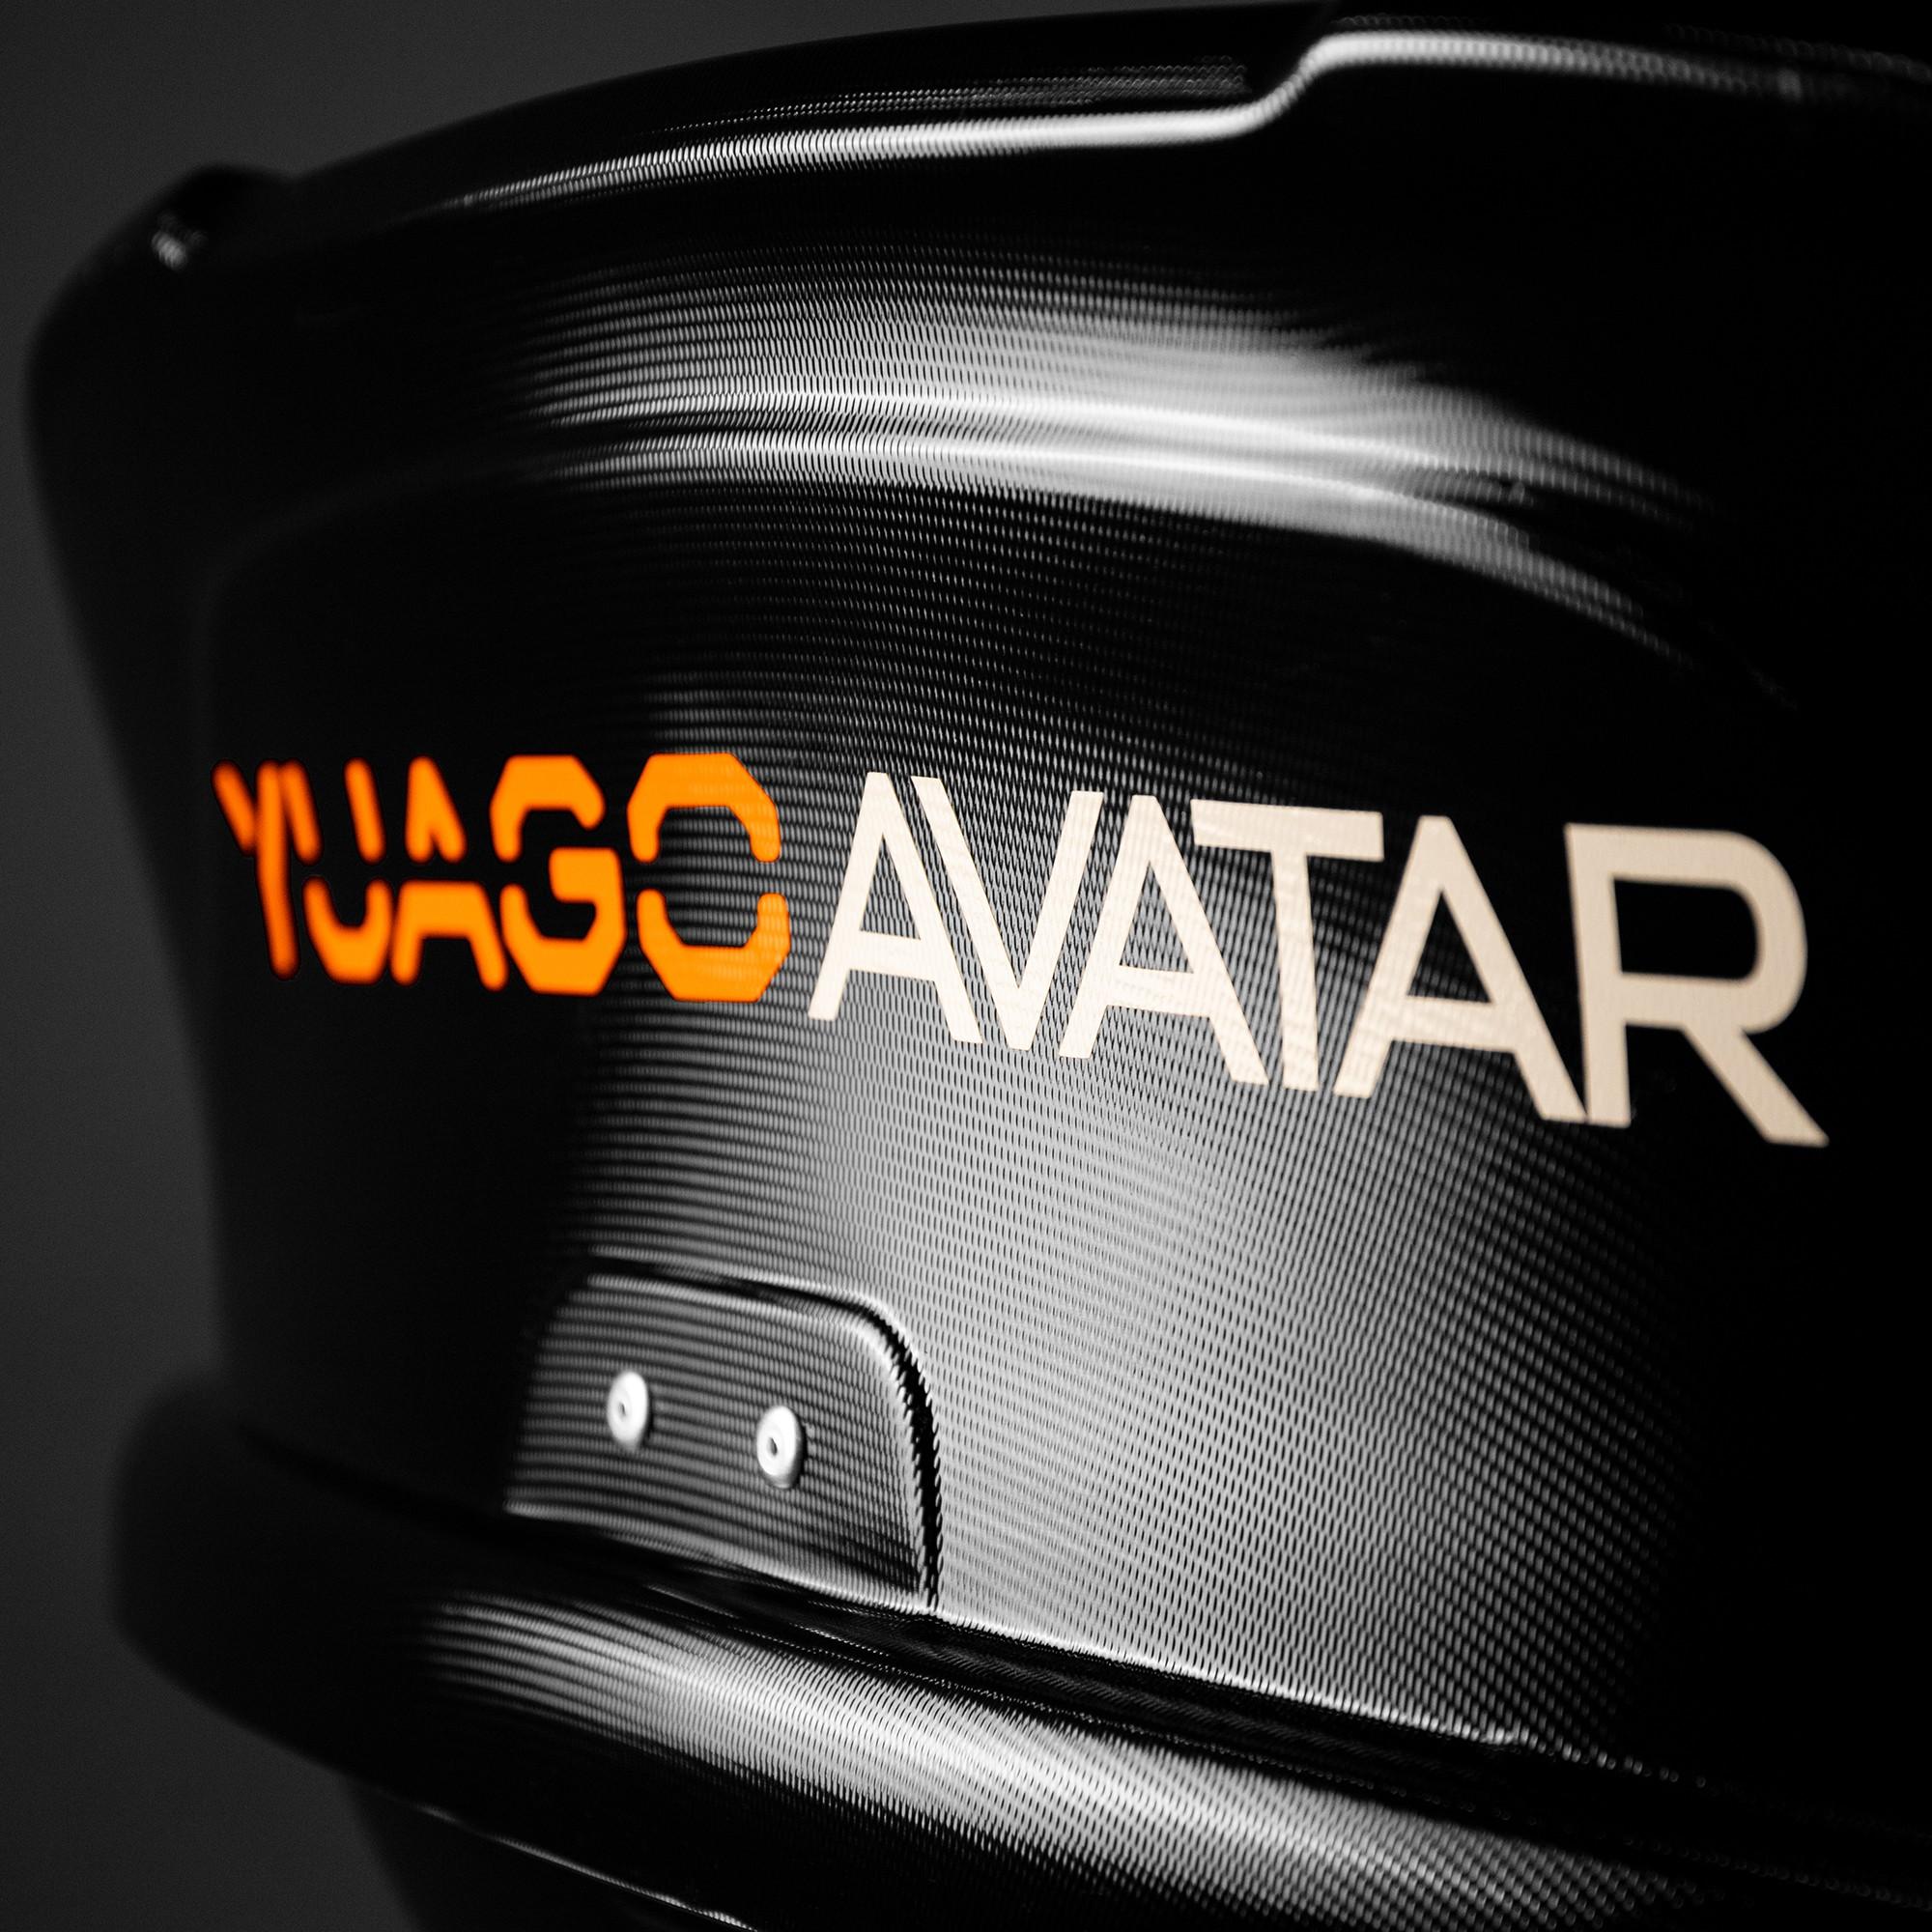 AVATAR_2000x2000_carbonМонтажная область 8